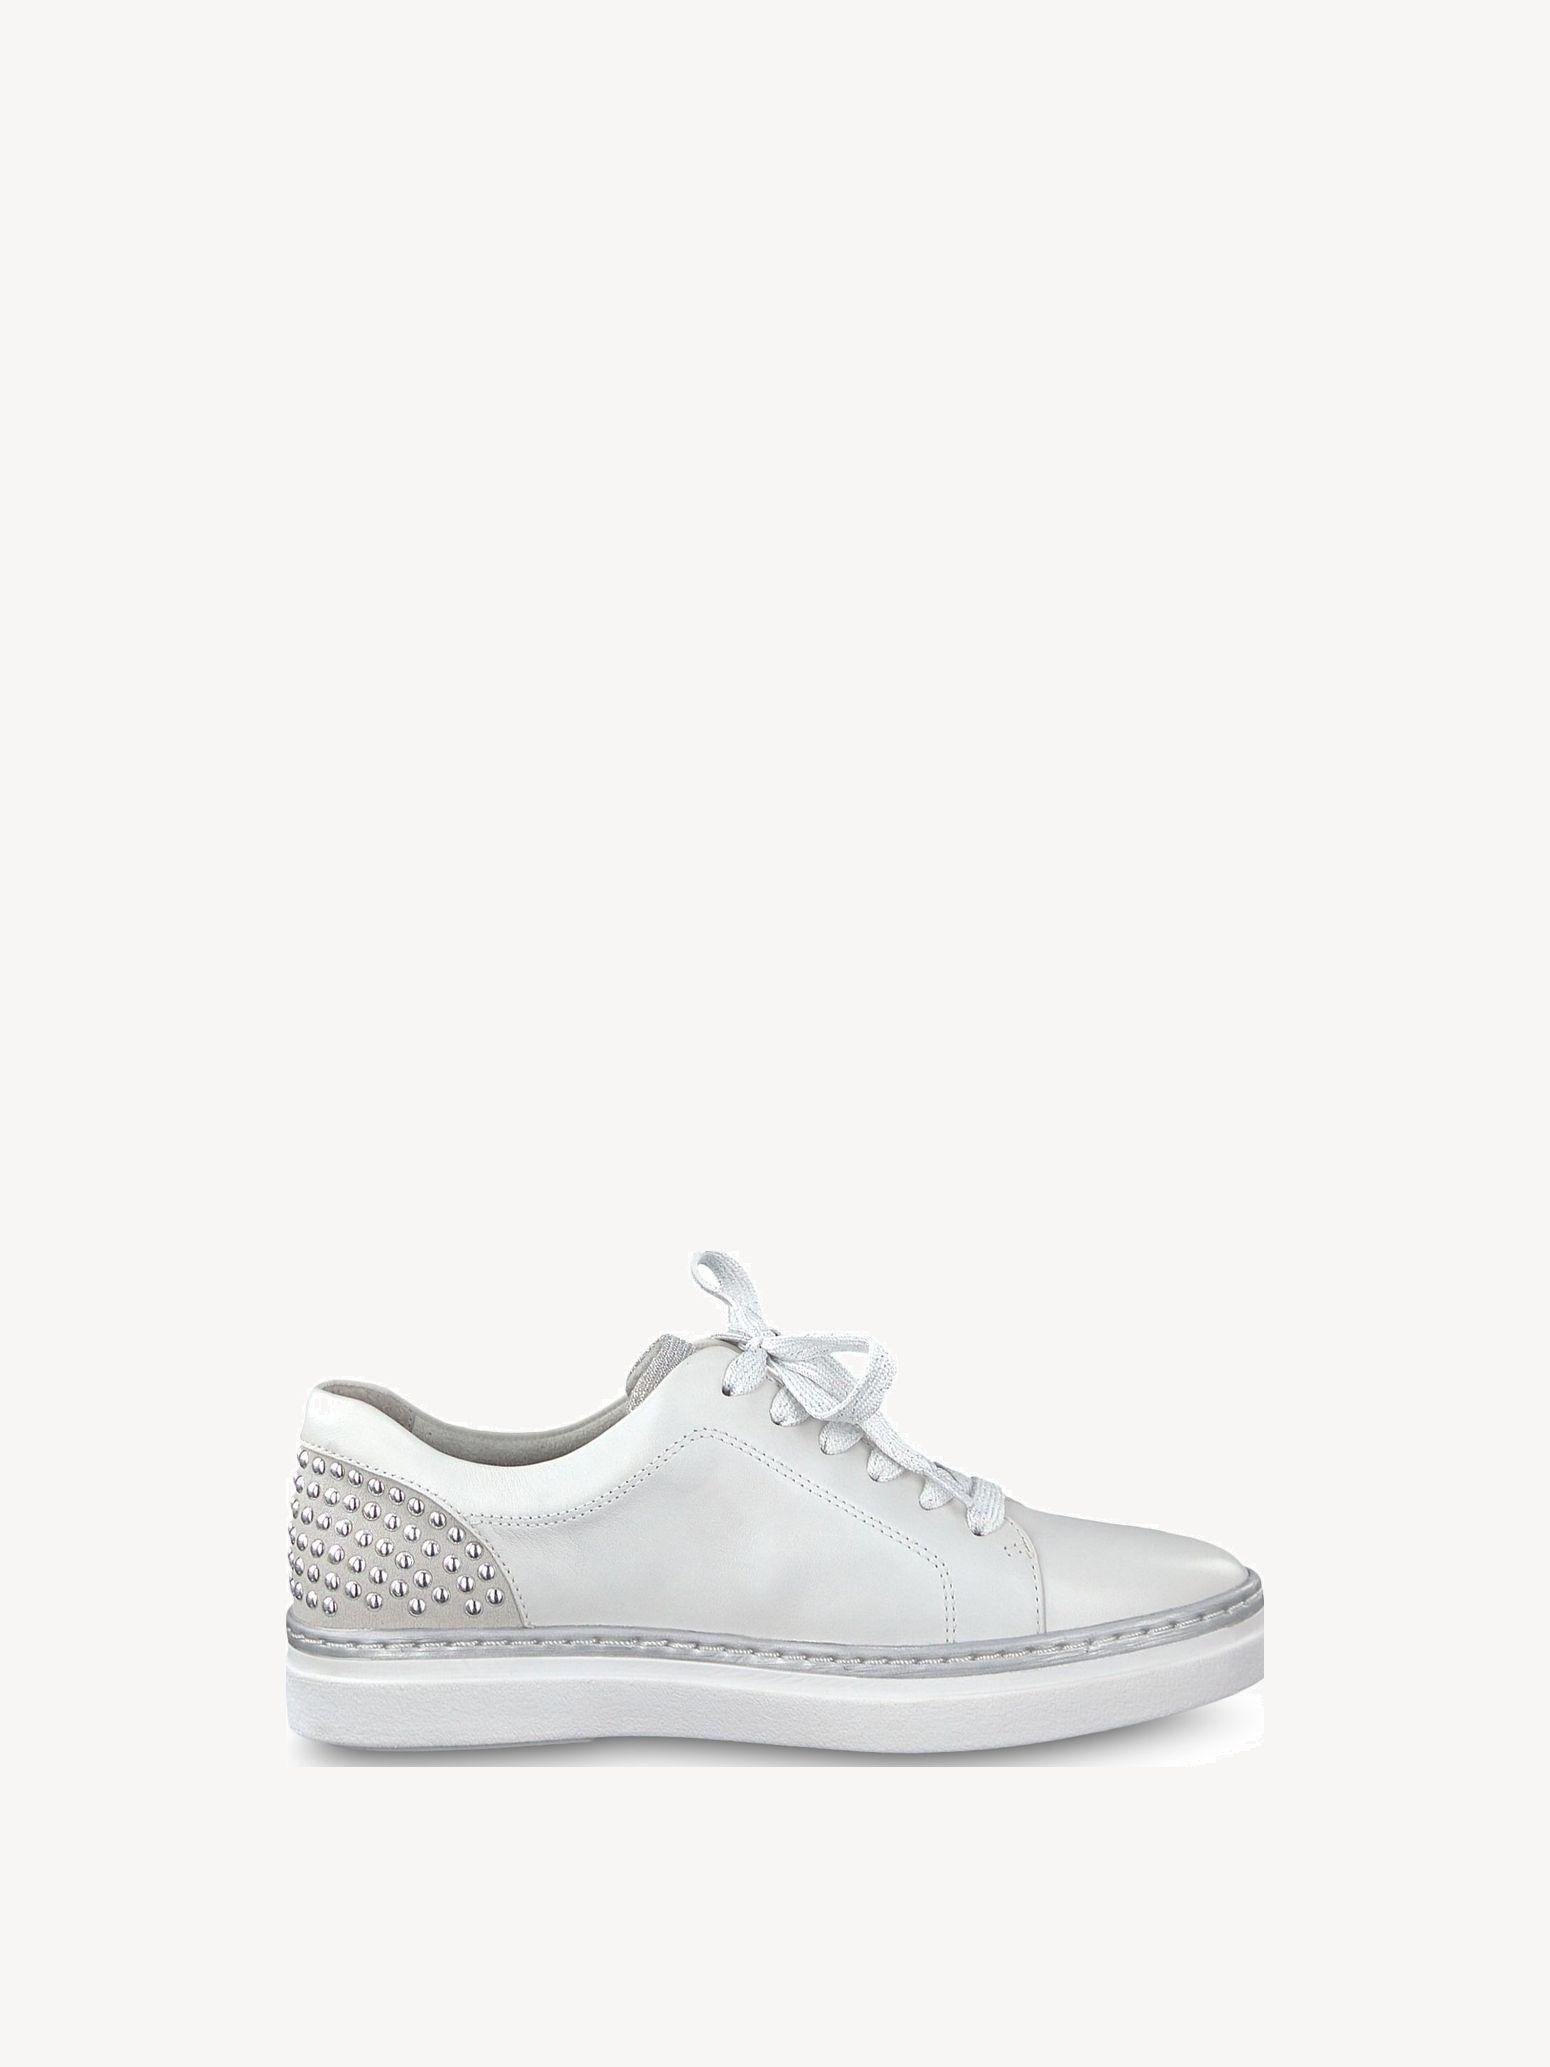 Chaussure basket Chaussures pour femme Tamaris Sneaker Milla